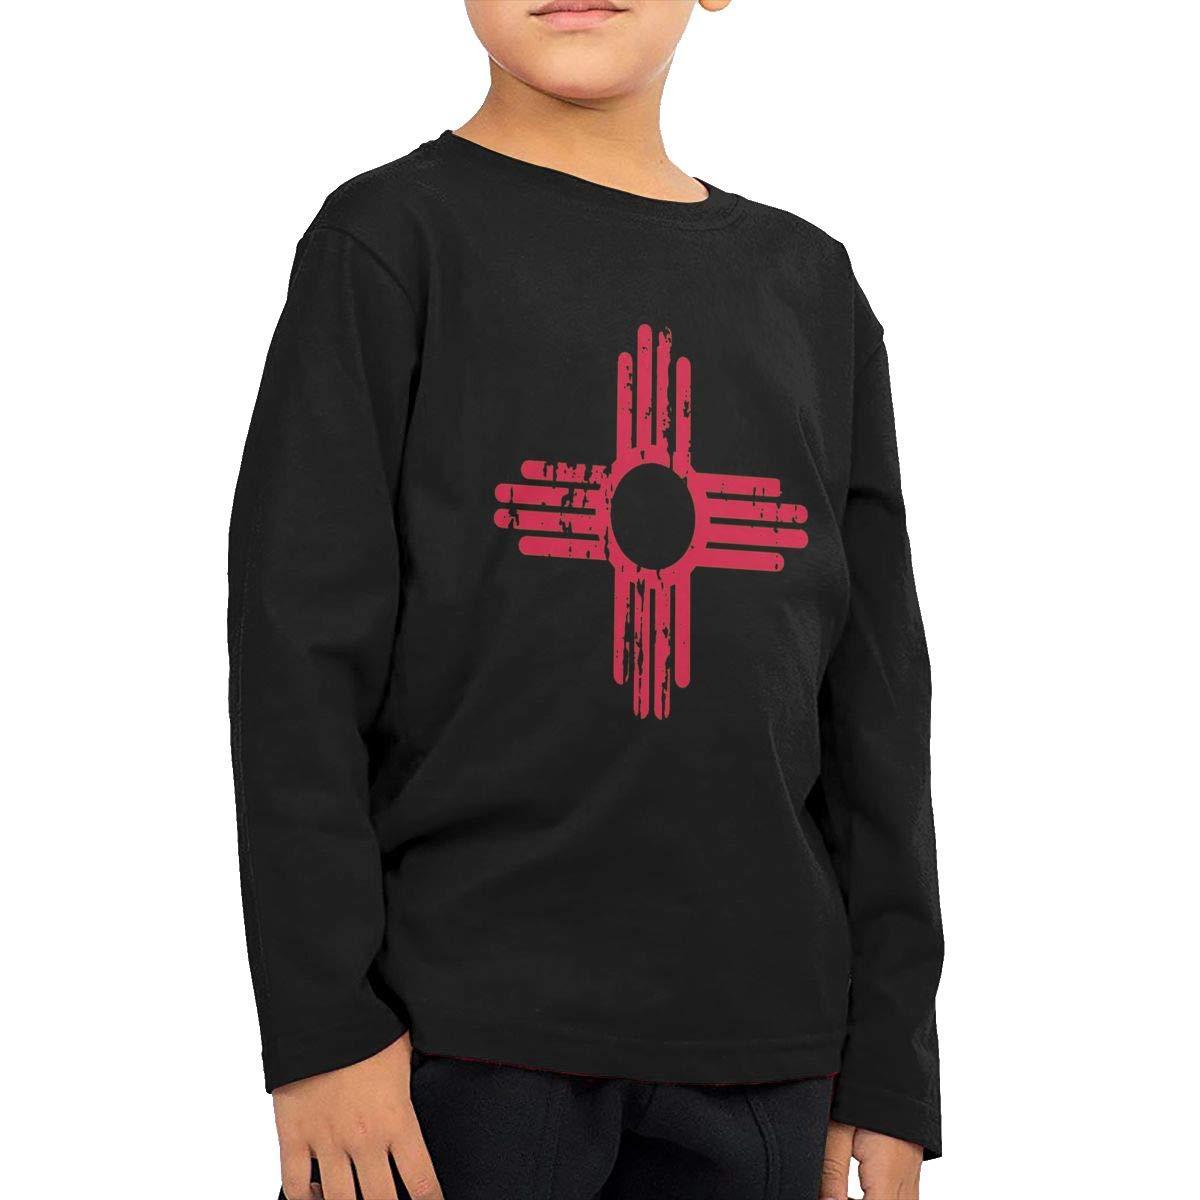 CY SHOP New Mexico Sun Symbol Childrens Boys Cotton Long Sleeve T Shirts